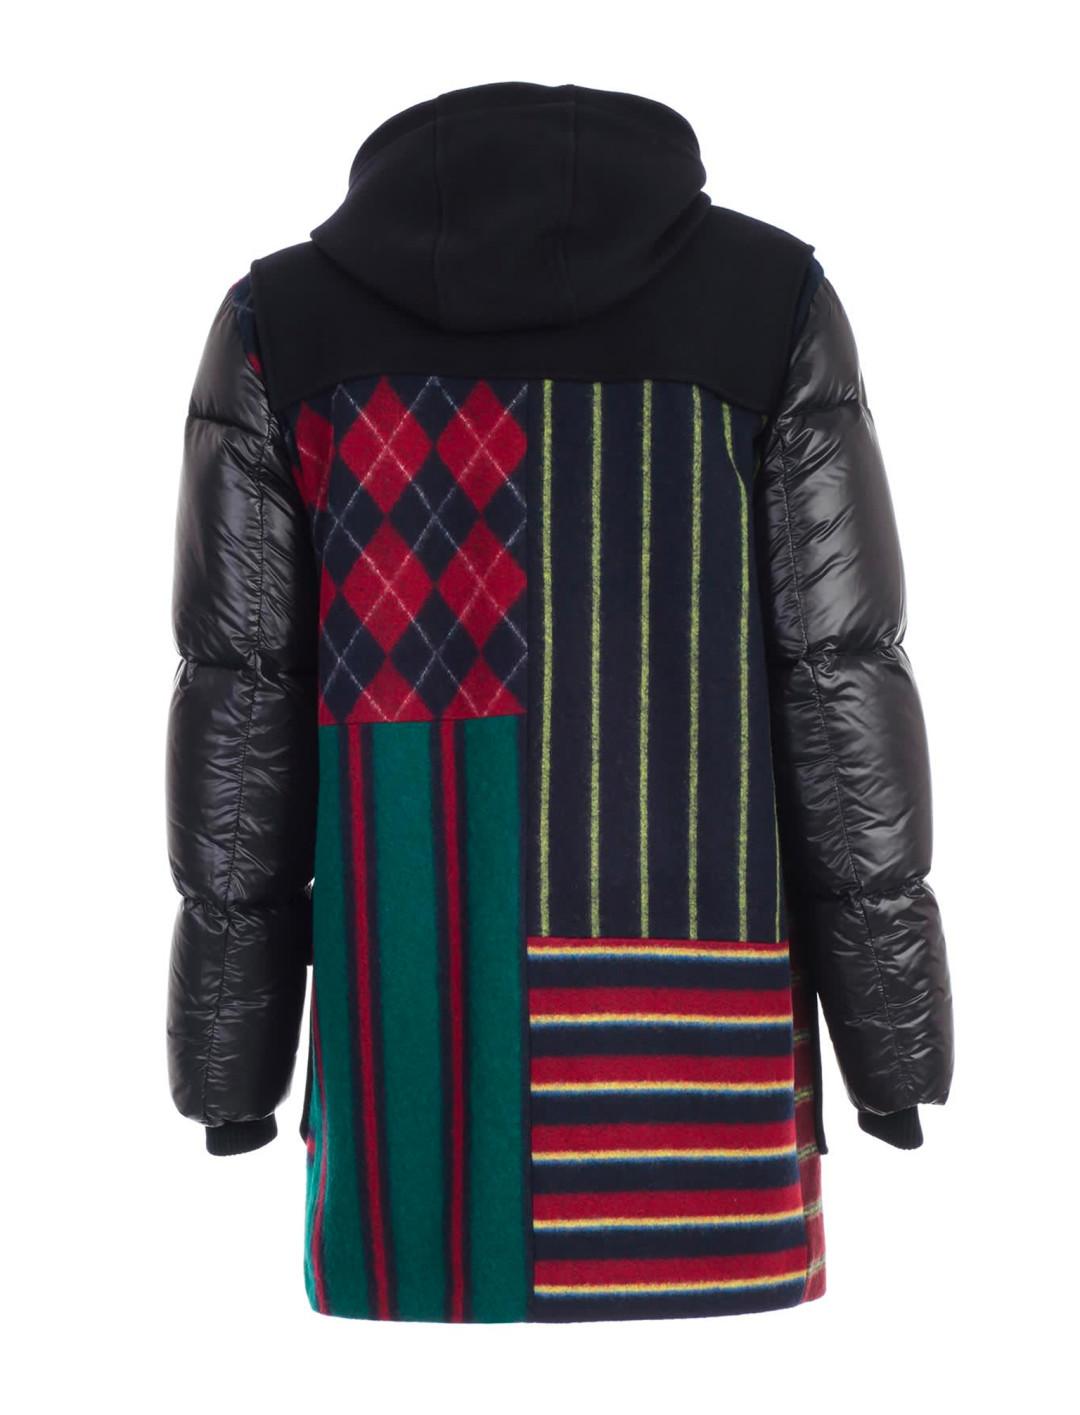 Duffle Coat Clothing